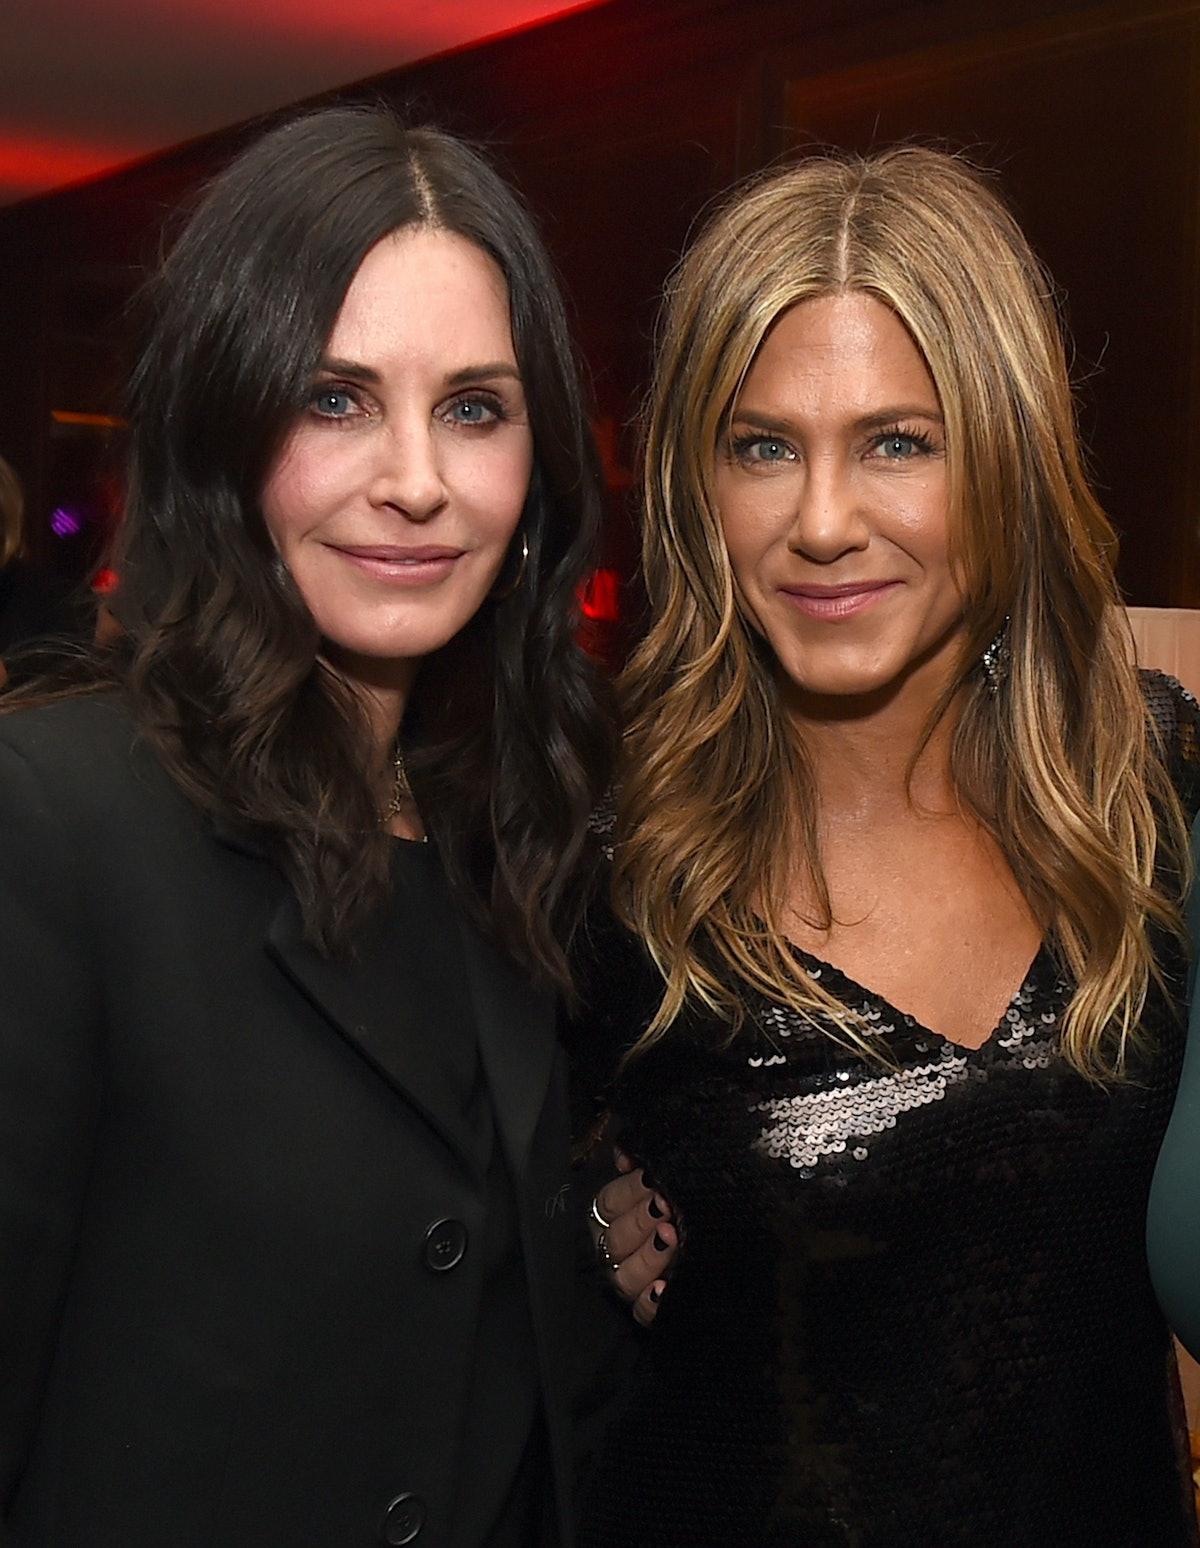 Jennifer Aniston and Courteney Cox